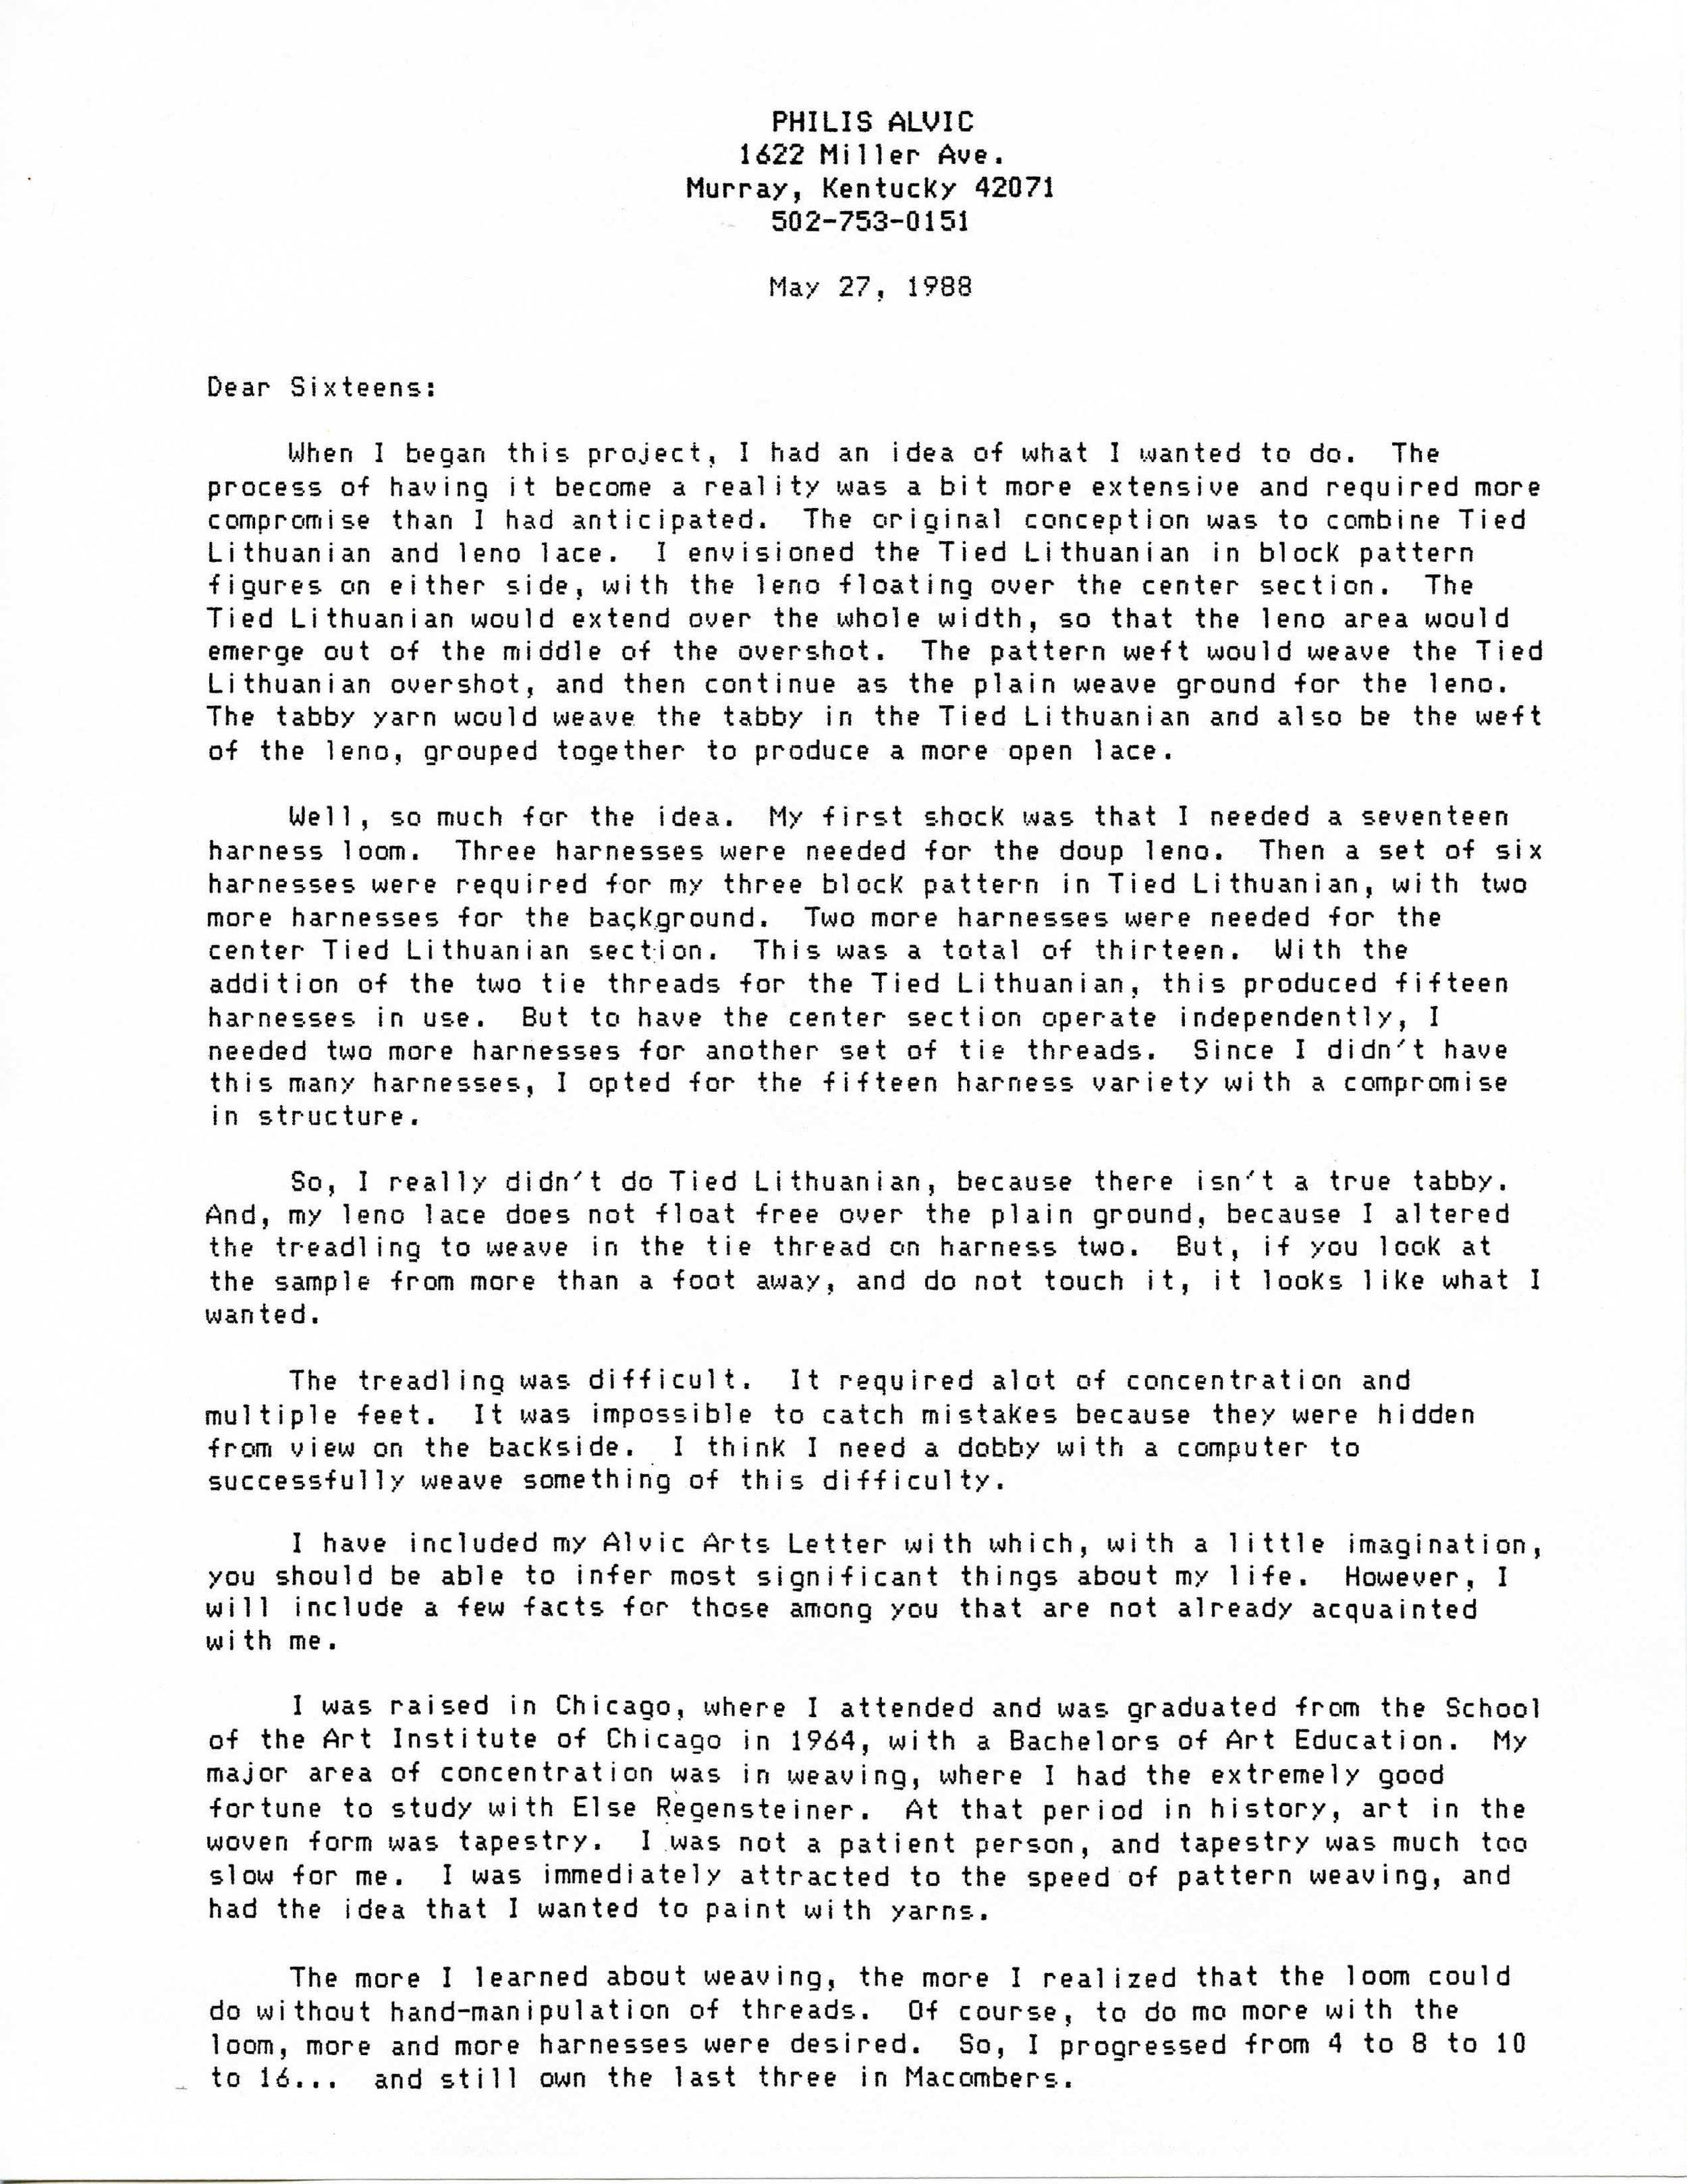 1988_Page_2_Image_0001.jpg